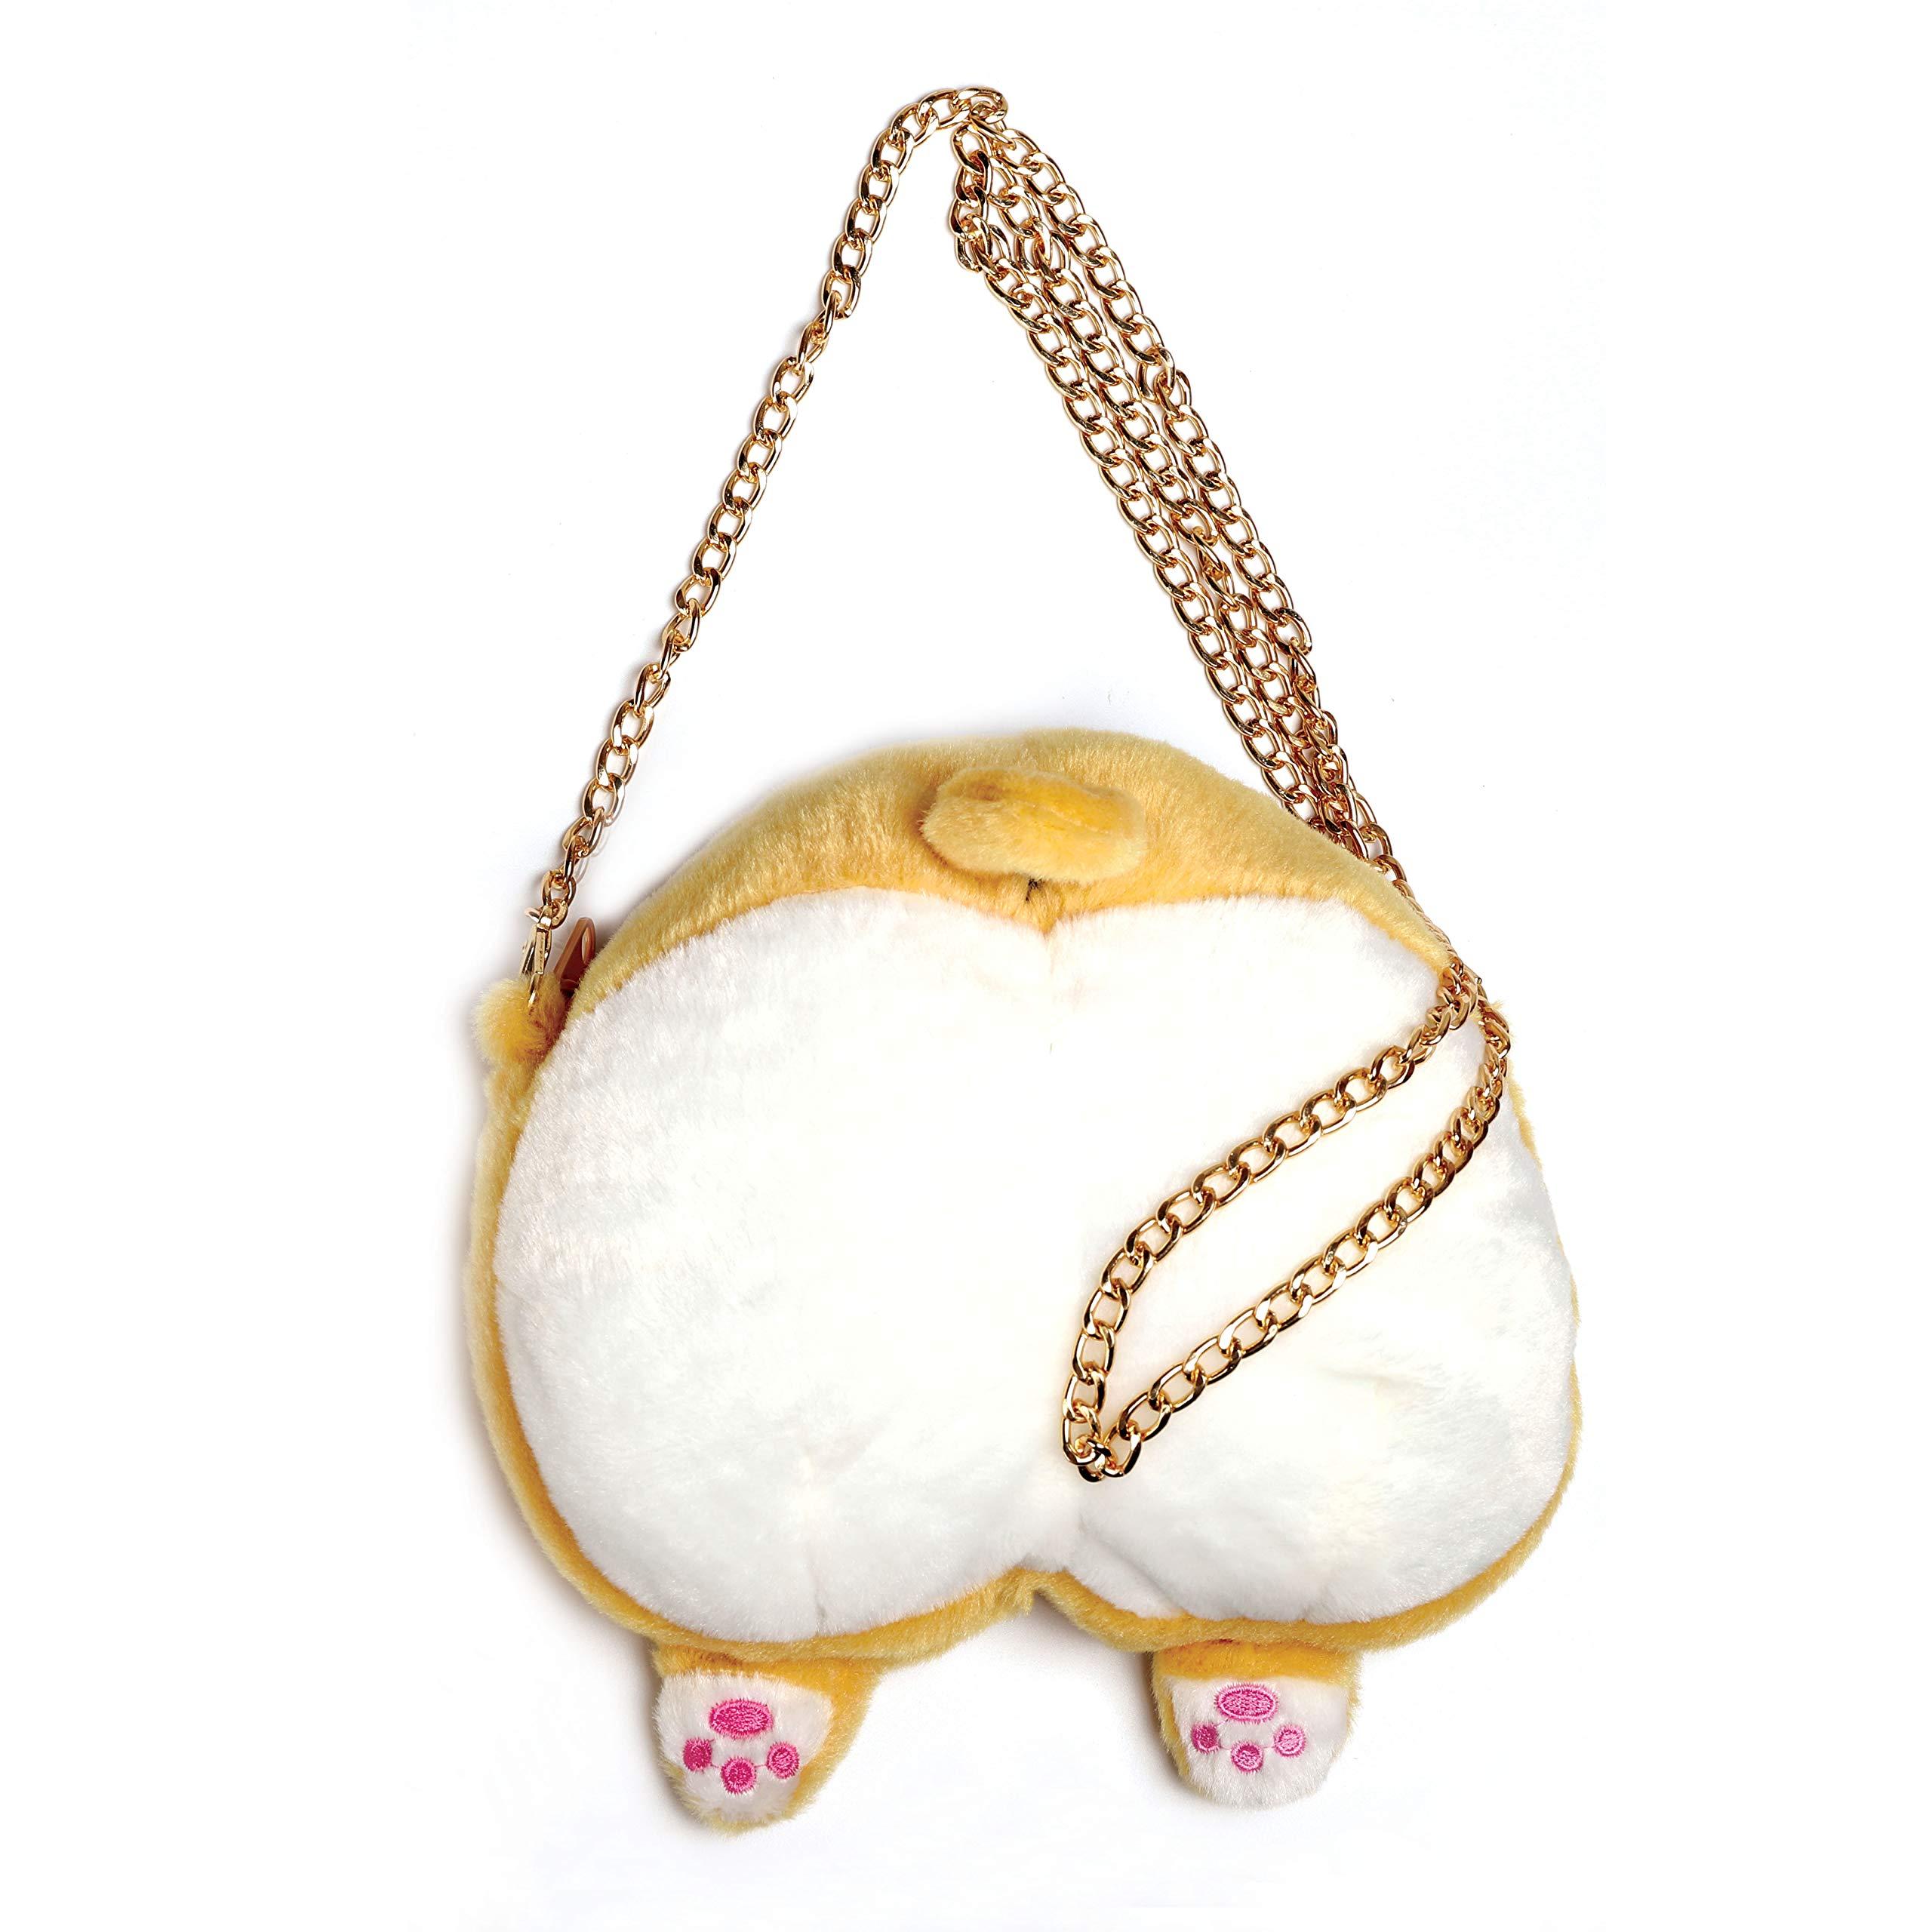 ANJUU Corgi Butt Handbag Cute Animal Corgi Butt Chain Bags Puppy Shoulder Bag for Kids Girls Women Birthday Gift